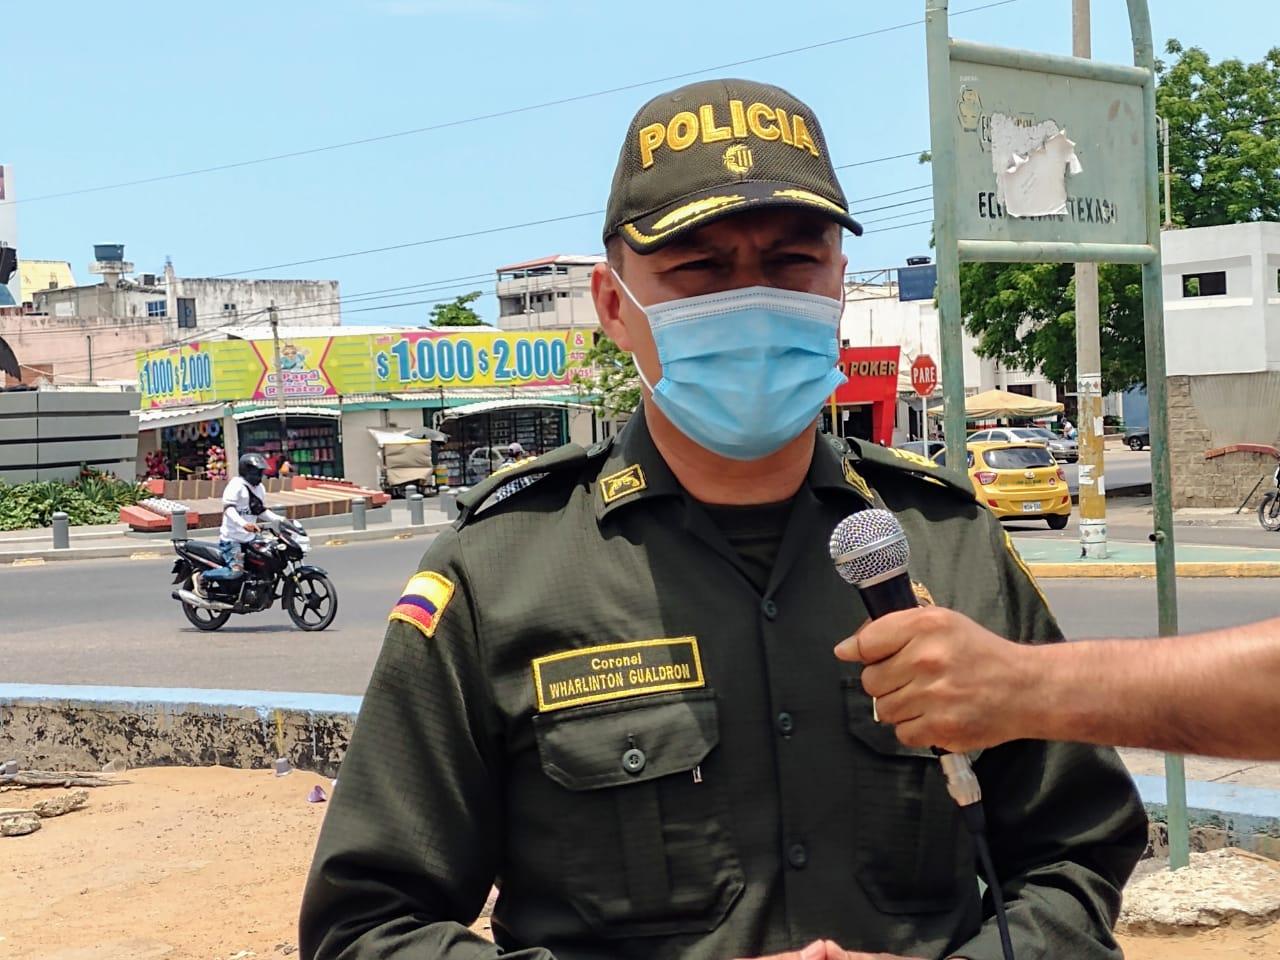 hoyennoticia.com, 310 comparendos se impusieron en La Guajira durante Semana Santa